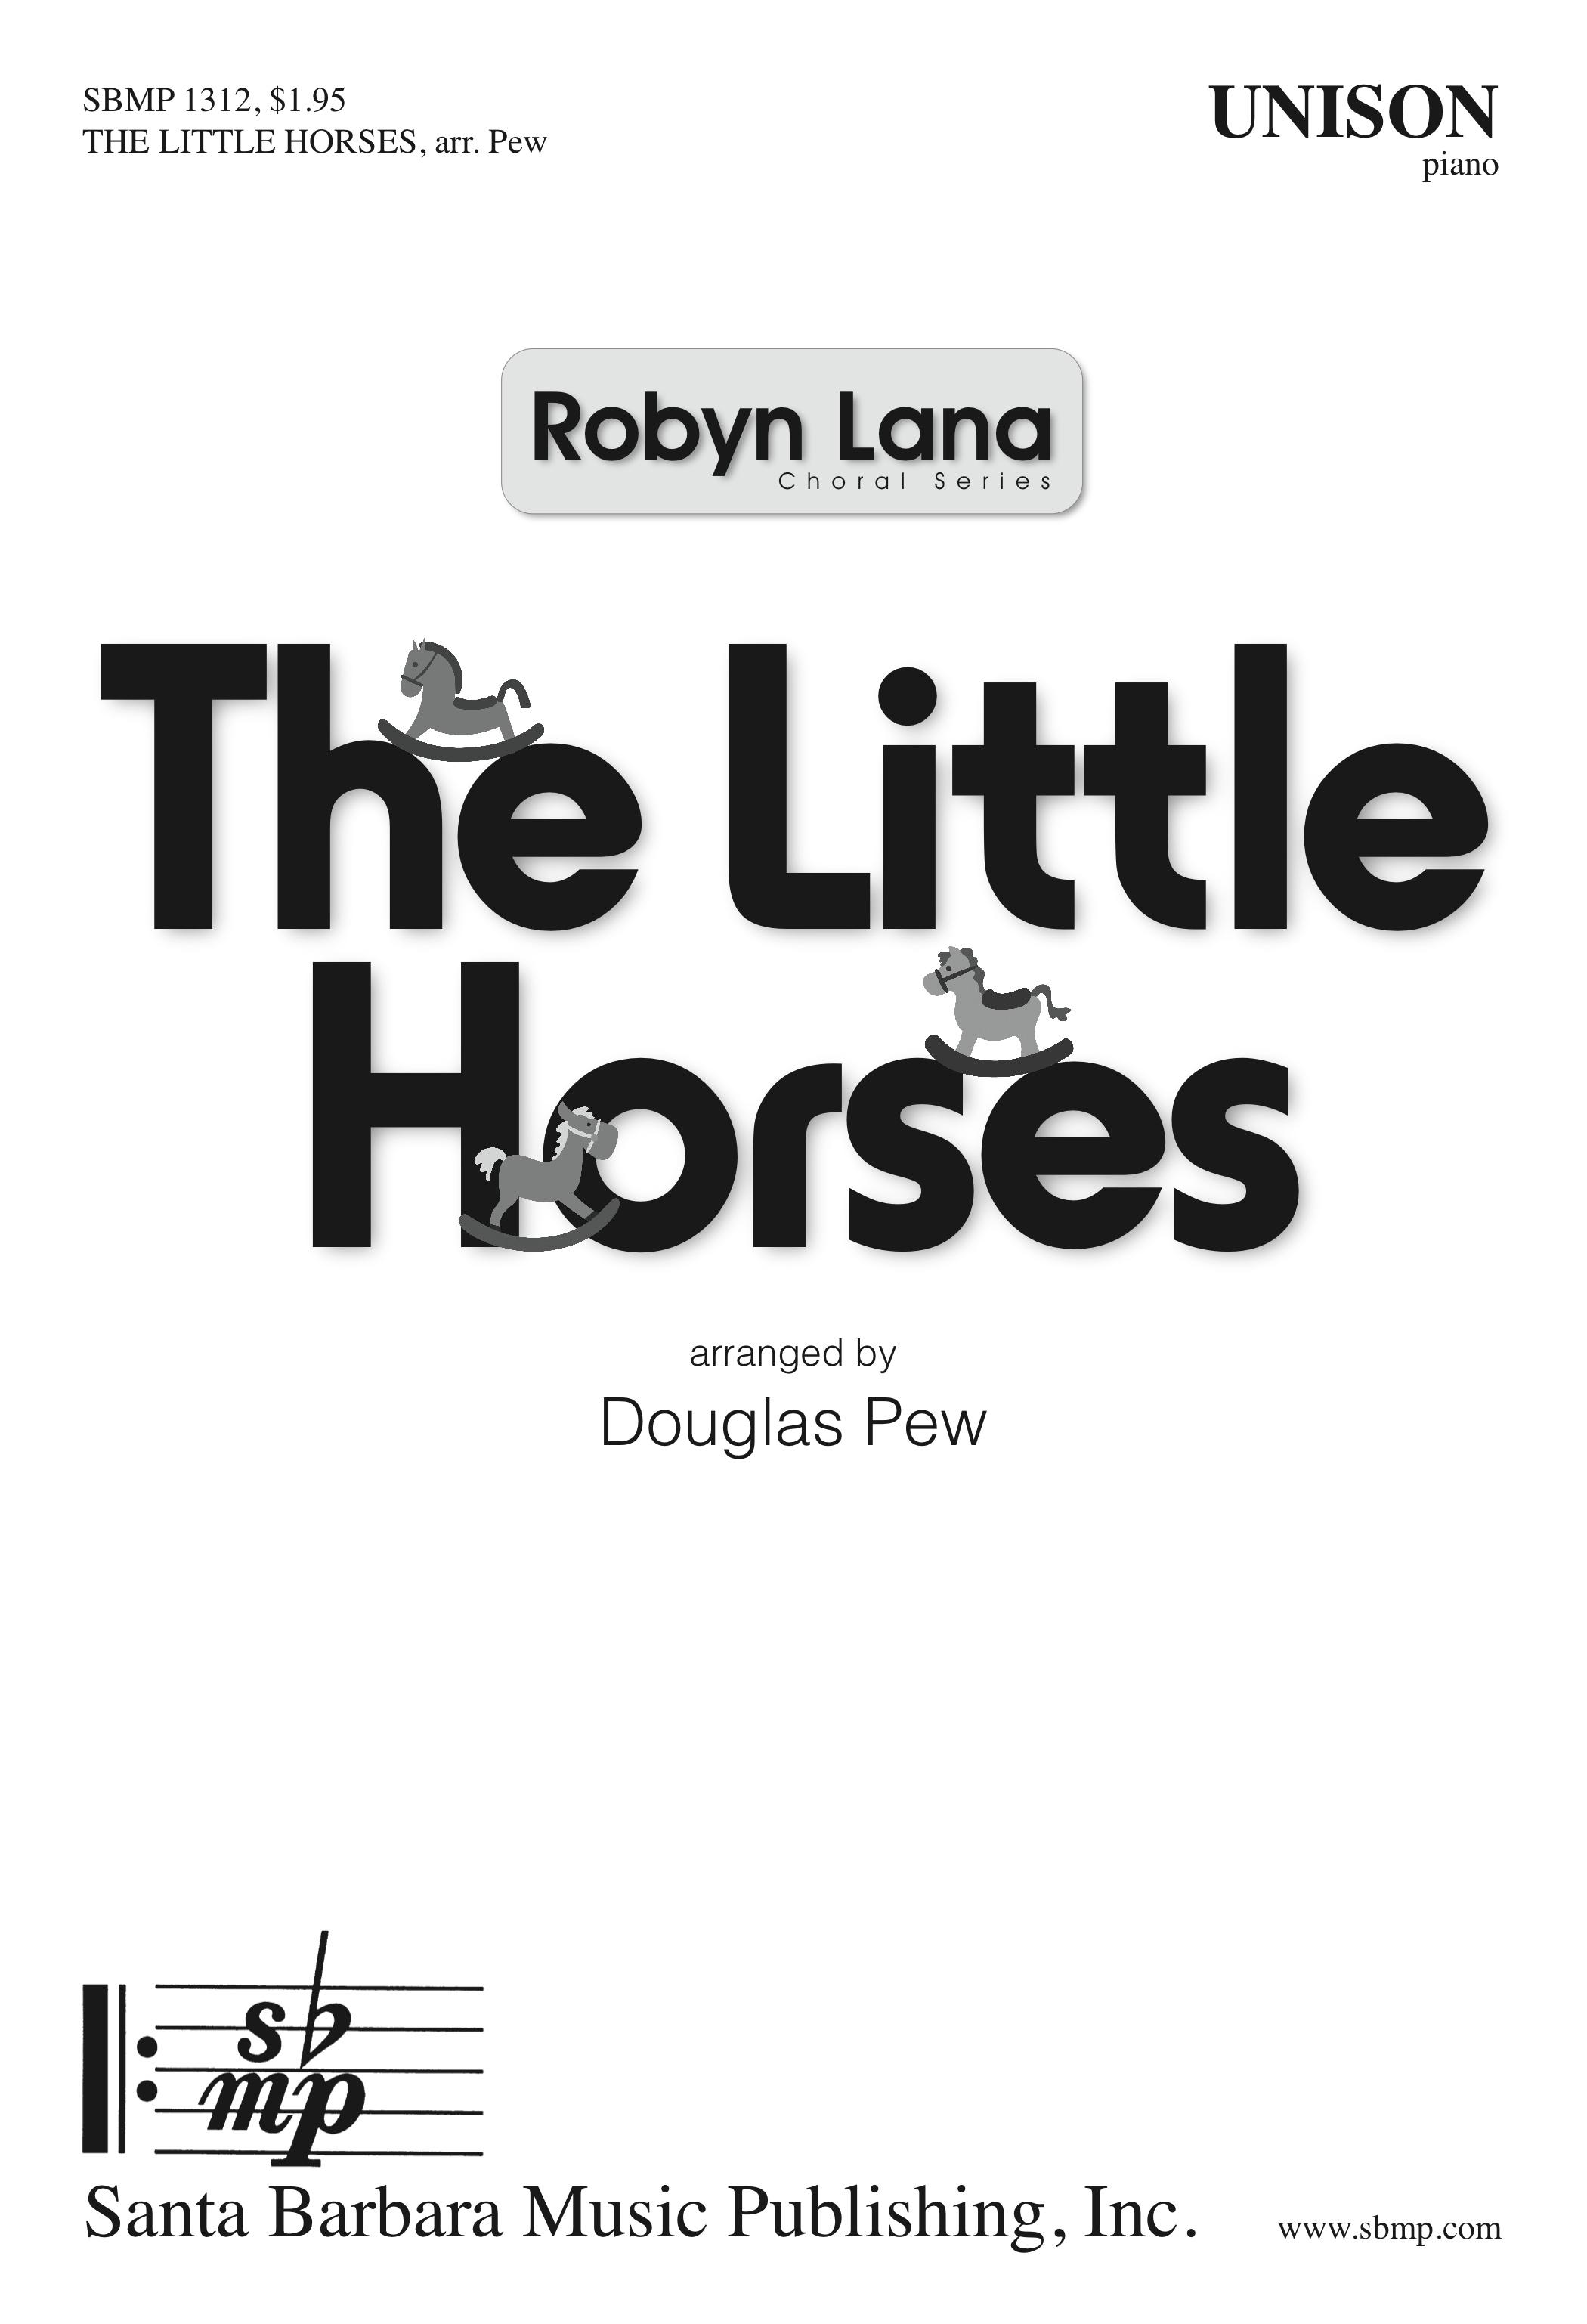 The LIttle Horses (1312) Final proof 1.jpg